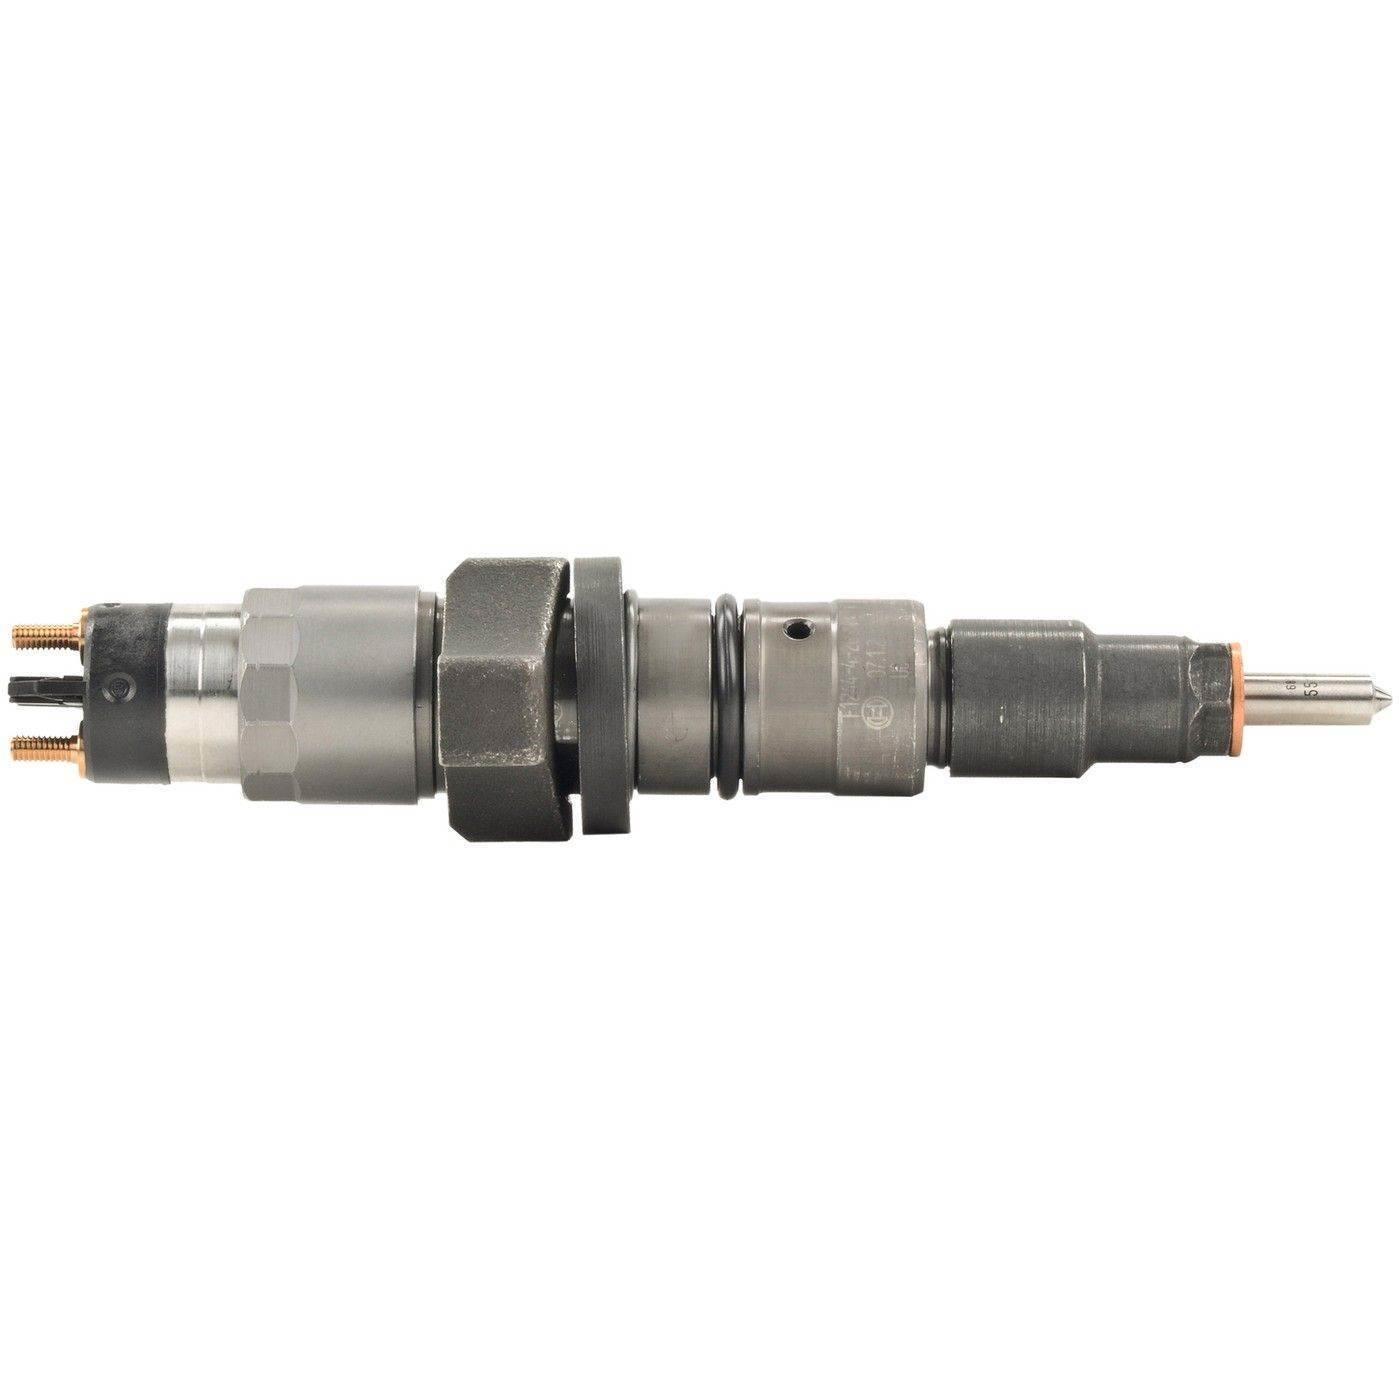 5.9L Injector Connector Tube Set Genuine Bosch Fits 03-07 Dodge Cummins Diesel